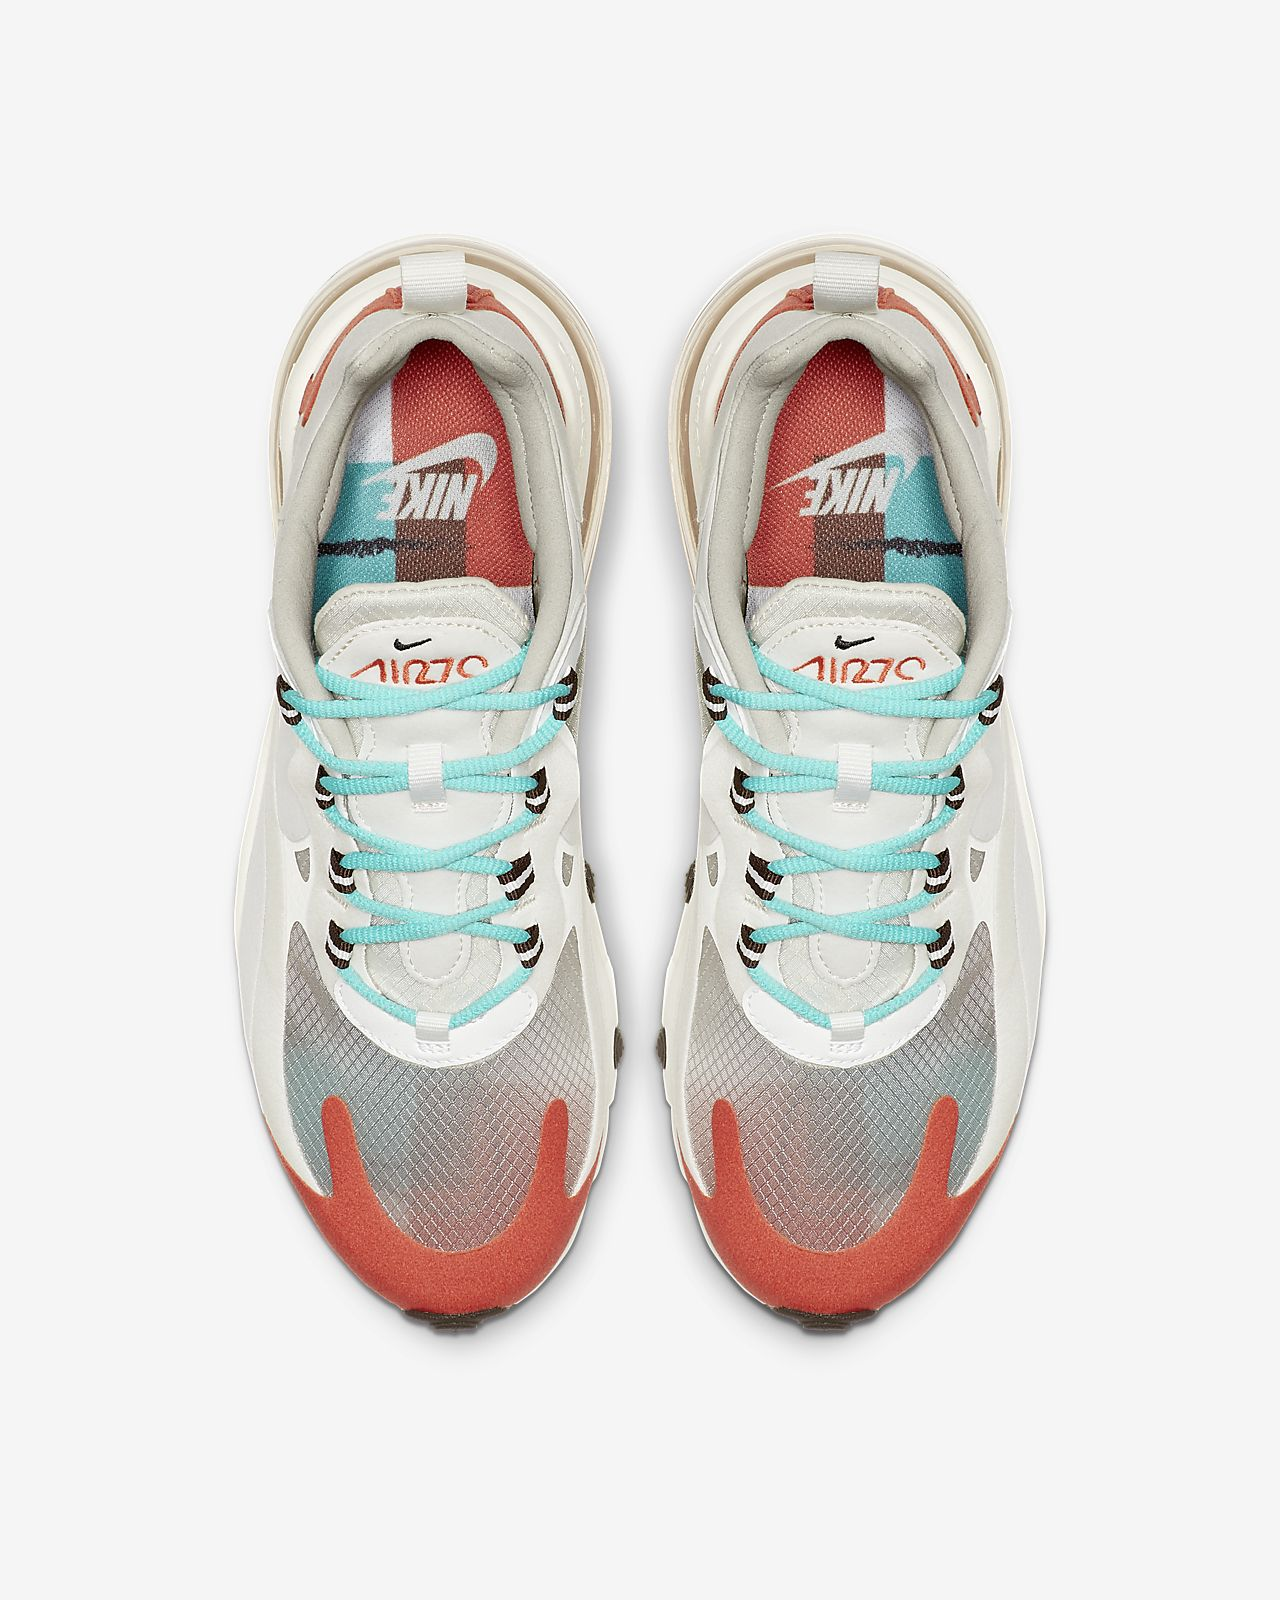 Nike Air Max 270 React Light Beige Chalk Size 6 7 8 9 Womens